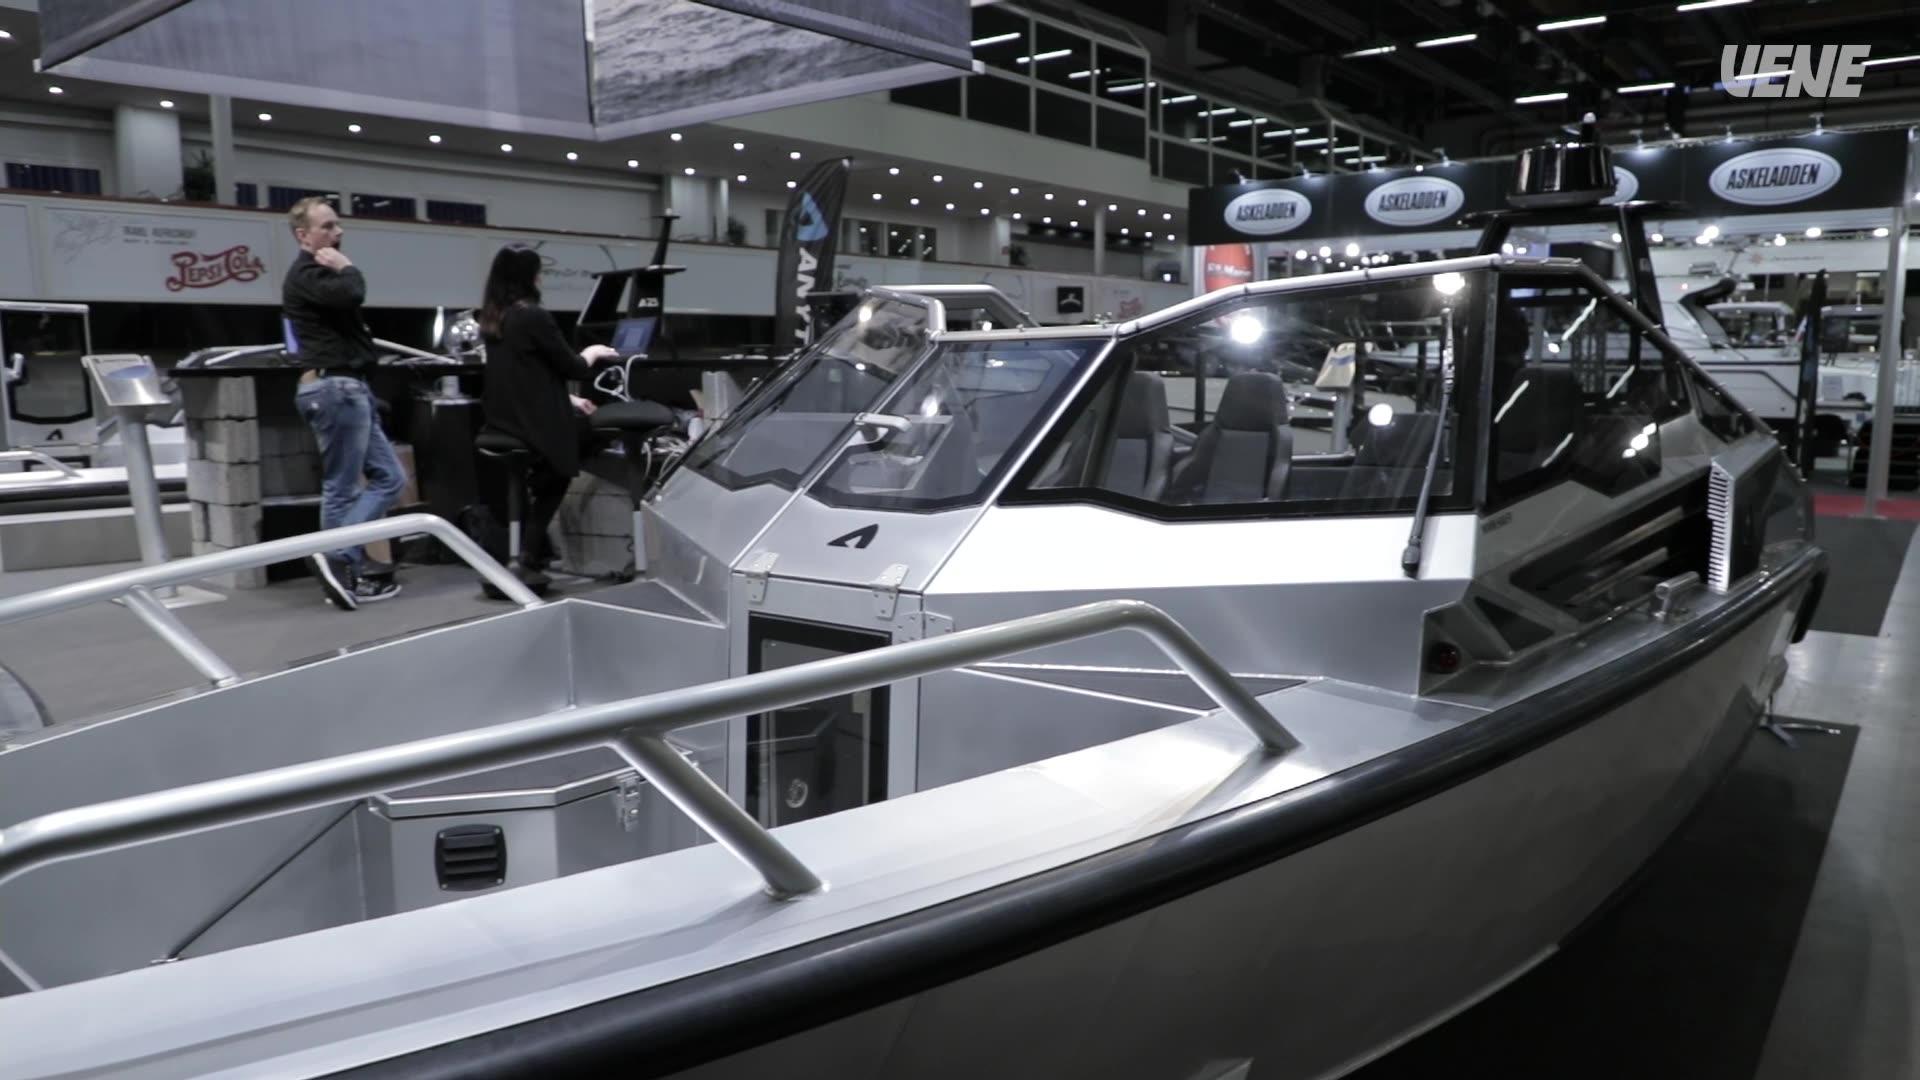 Vene 18 Båt: Messujen avomoottoriveneeksi valittiin Anytec A27